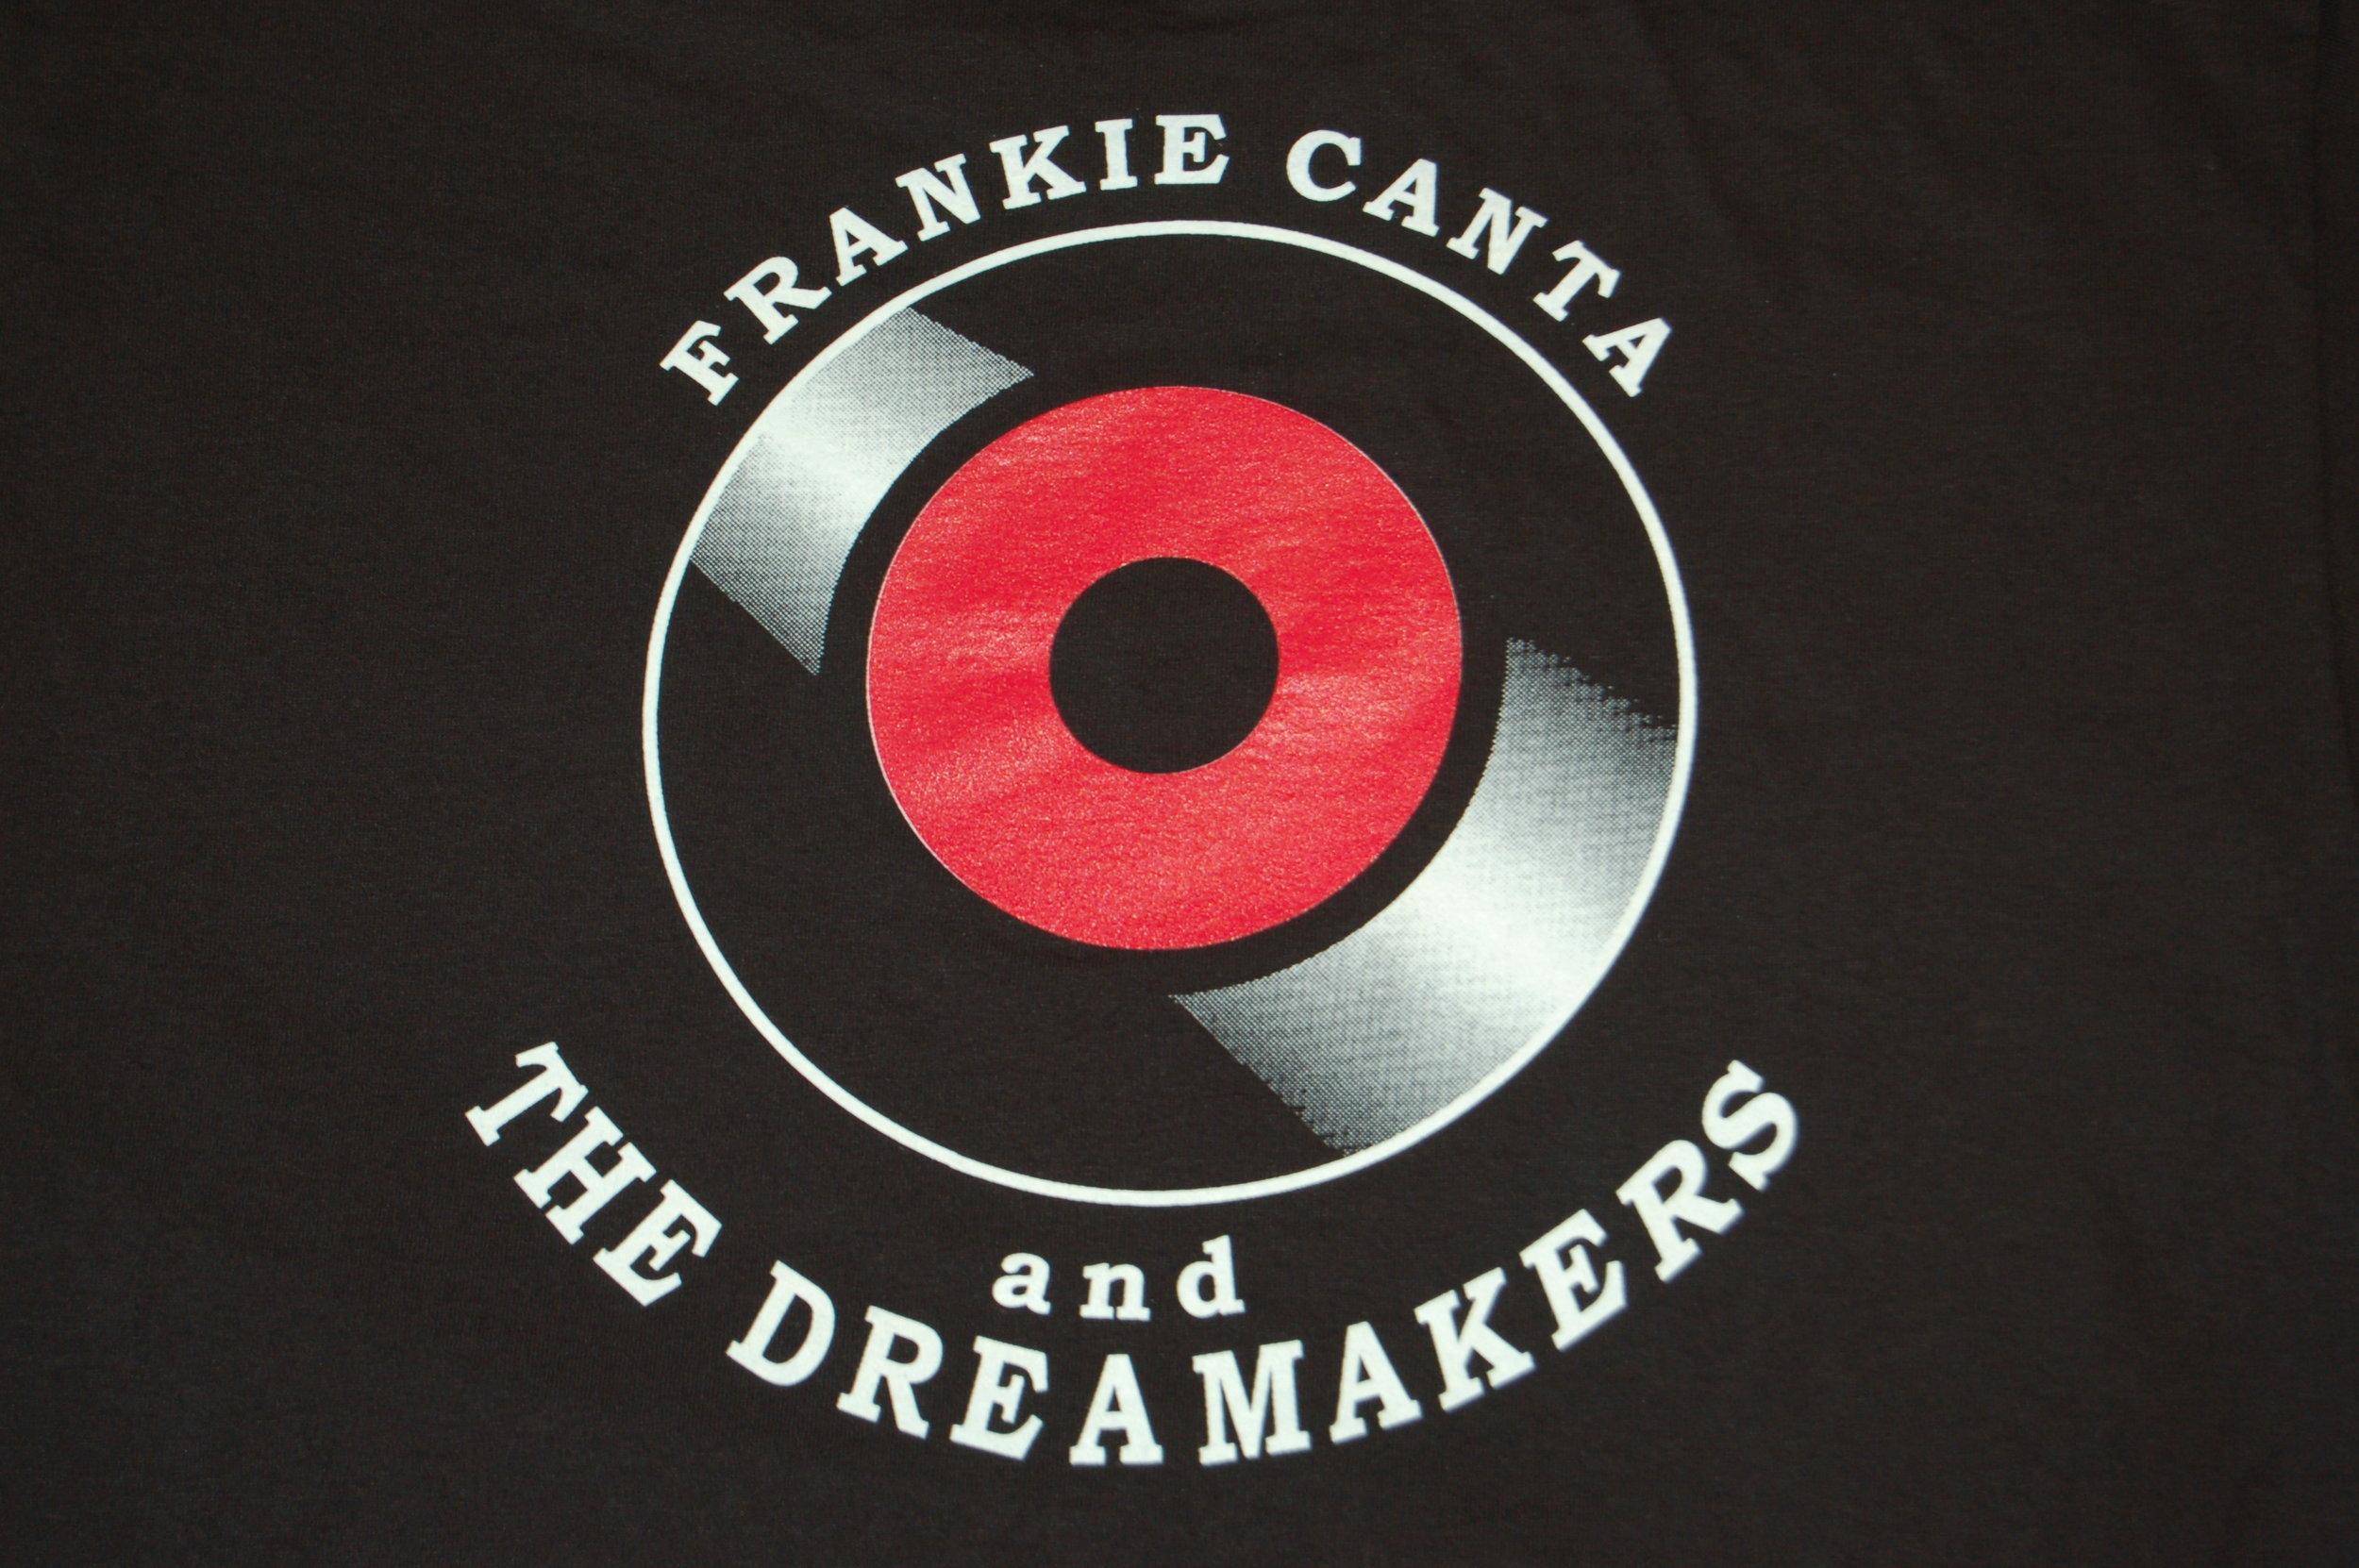 Dreamakers back 2.JPG